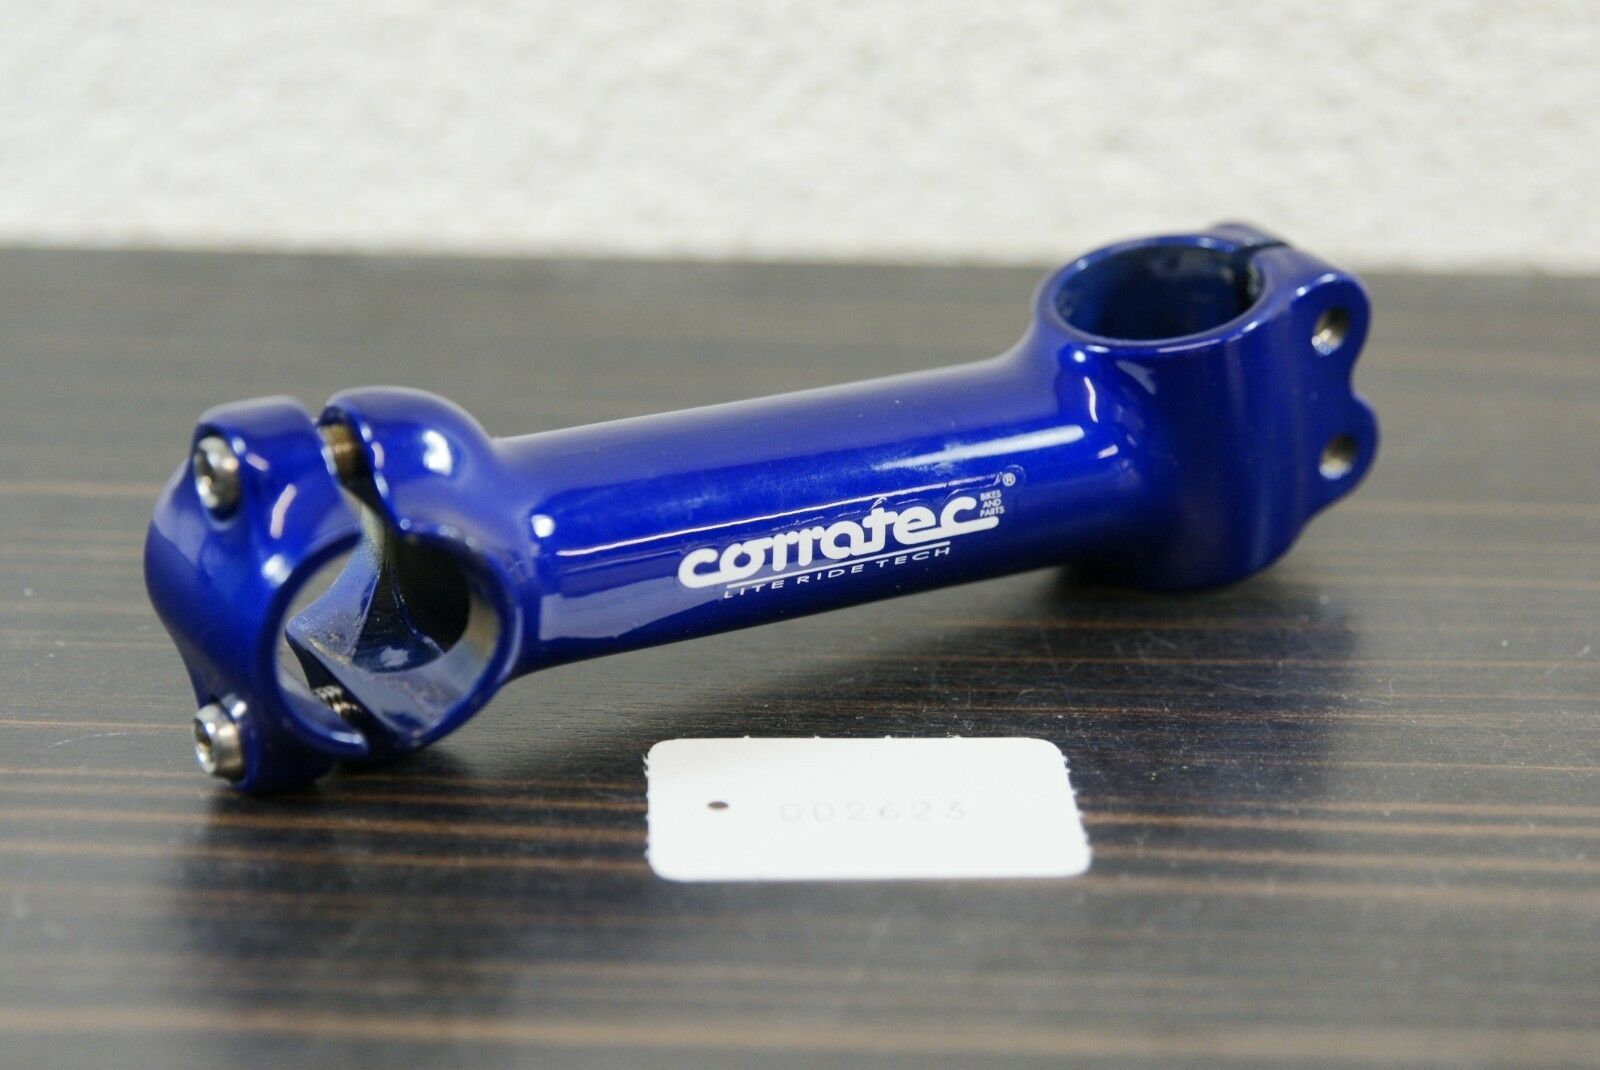 Corratec Ahead Vorbau 130mm 1 1 8  Schaftkl. 25,4mm Lenkerkl. Kult Retro NOS NEU  | Zürich Online Shop